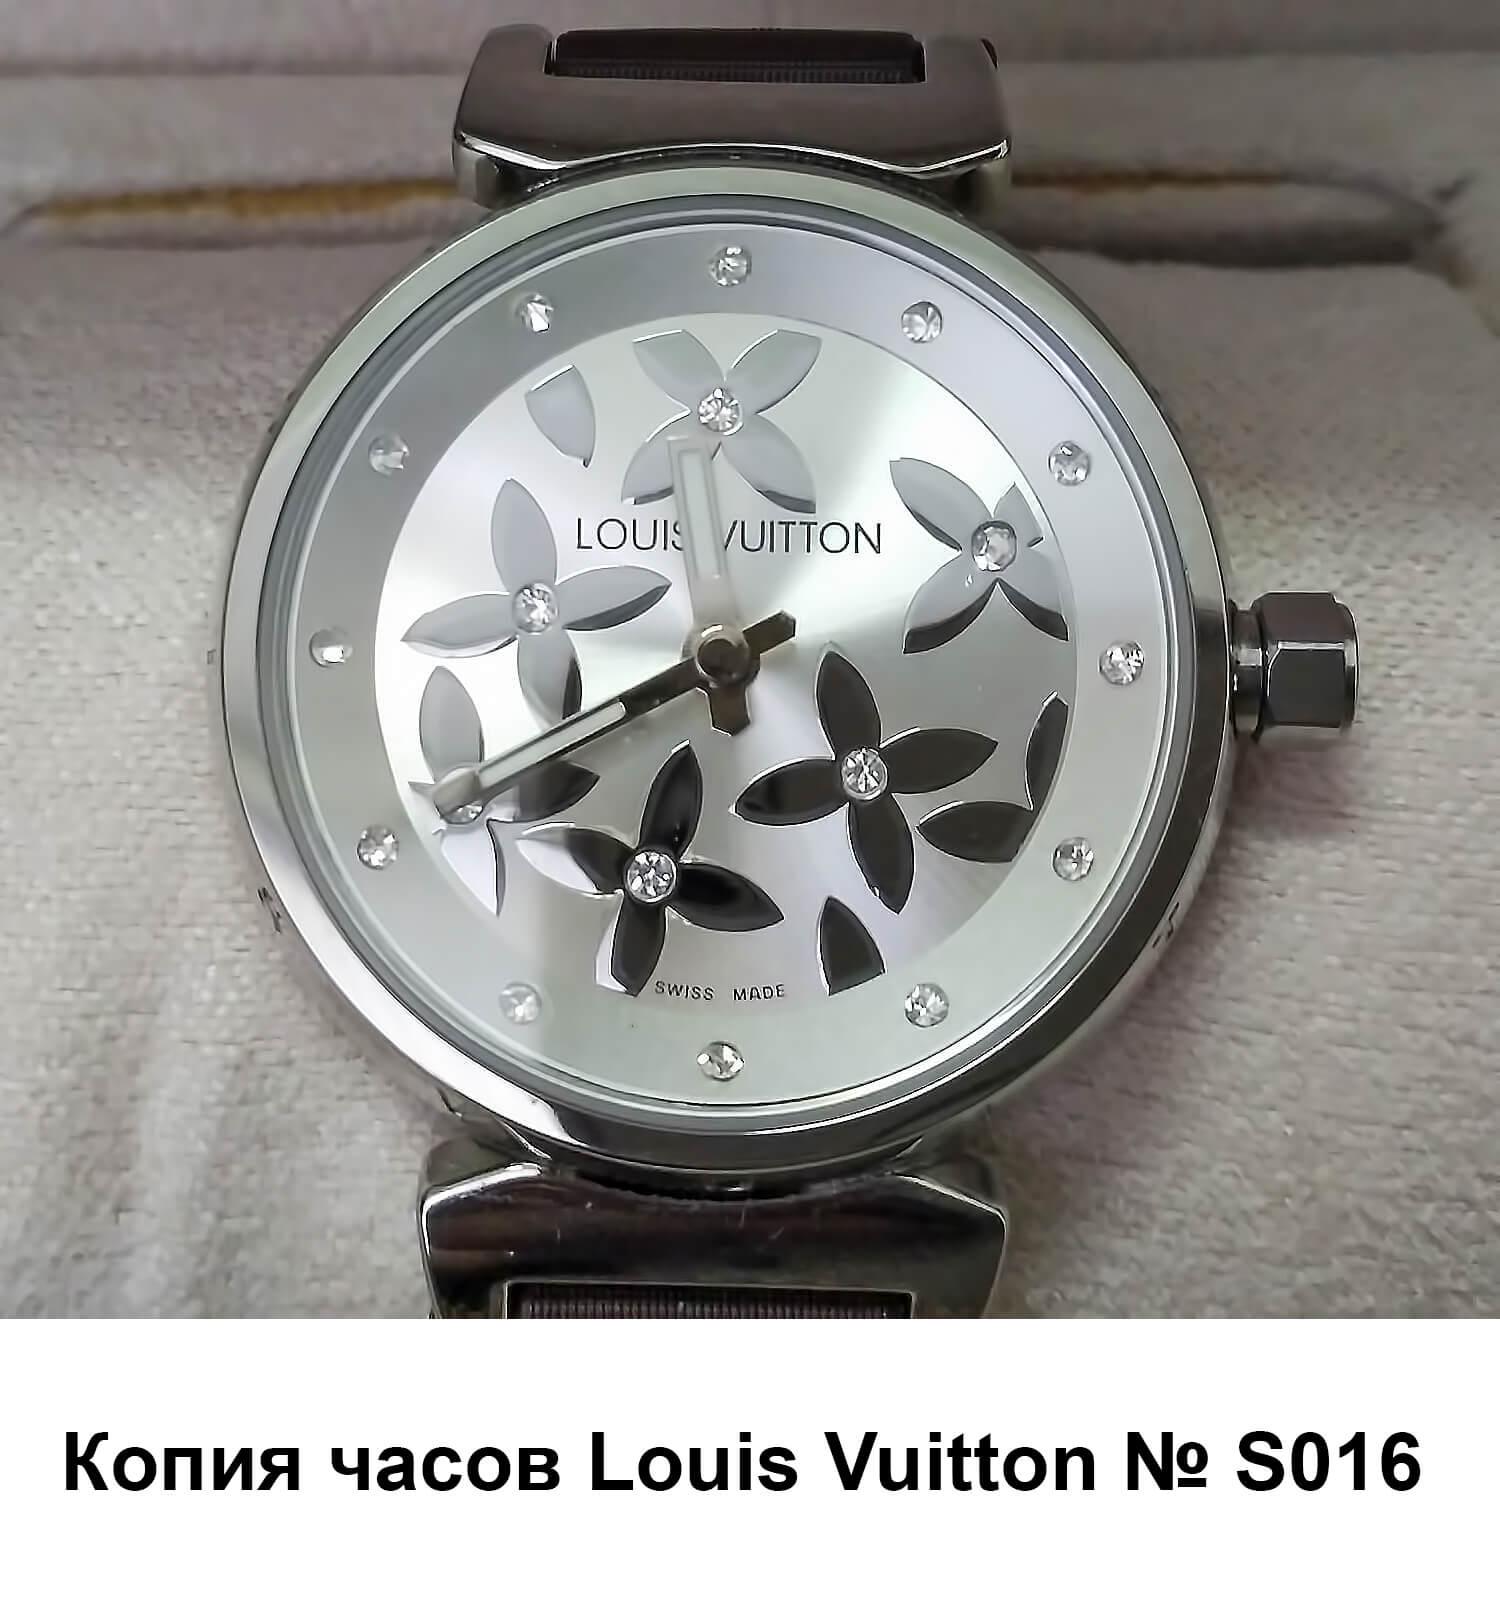 5cb0313d ... Реплика часов Louis Vuitton Tambour Elegants с серебристым корпусом и  коричневым ремешком